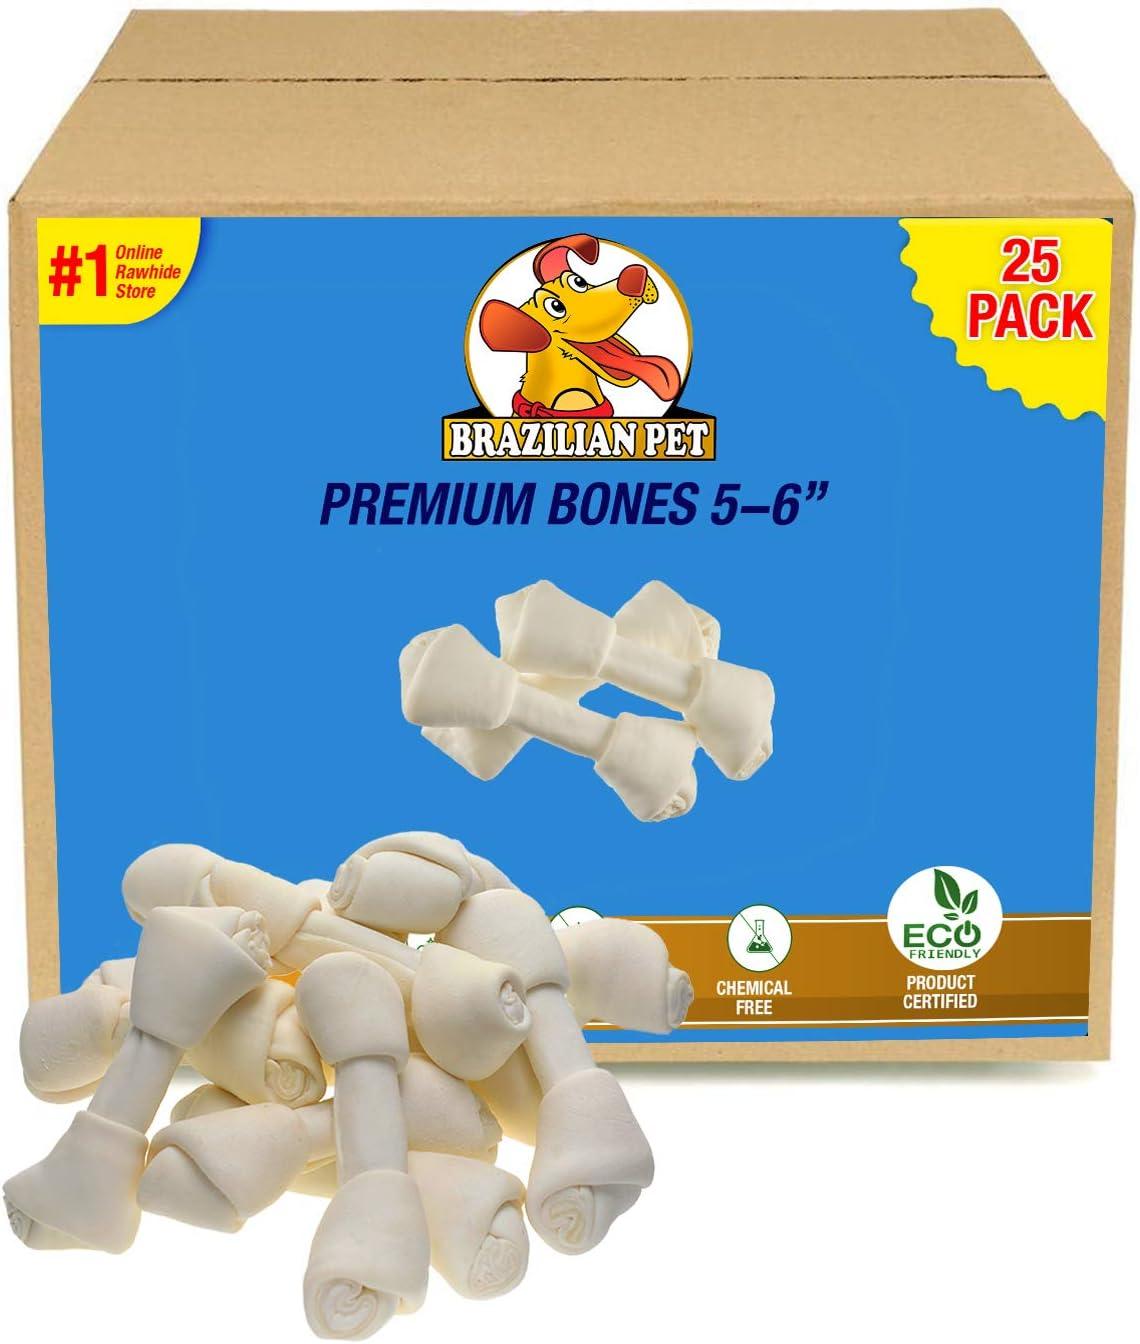 Brazilian Pet Rawhide Bones 5-6 Inches, Premium Quality Dog Bones, 100 Natural, Beef Hides Chews